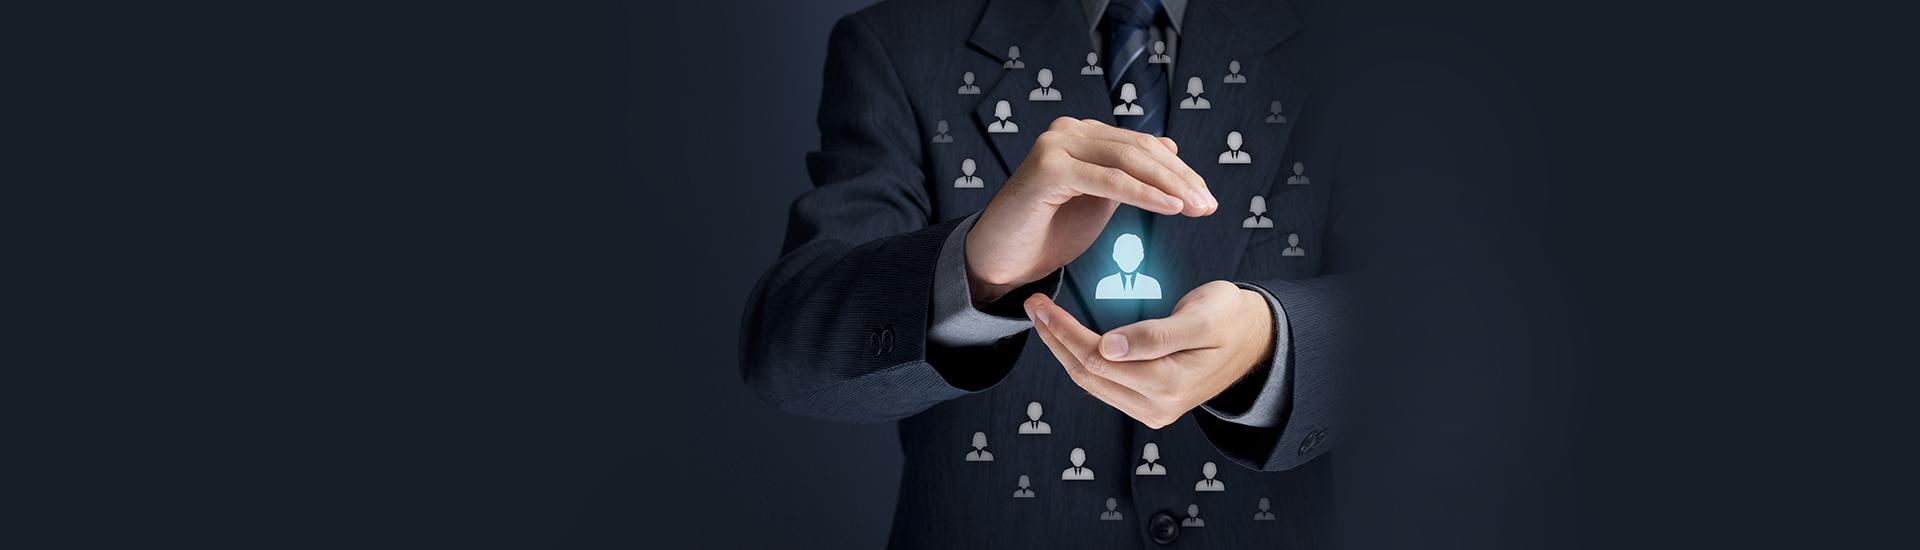 xlri-strategic-performance-management-human-resources